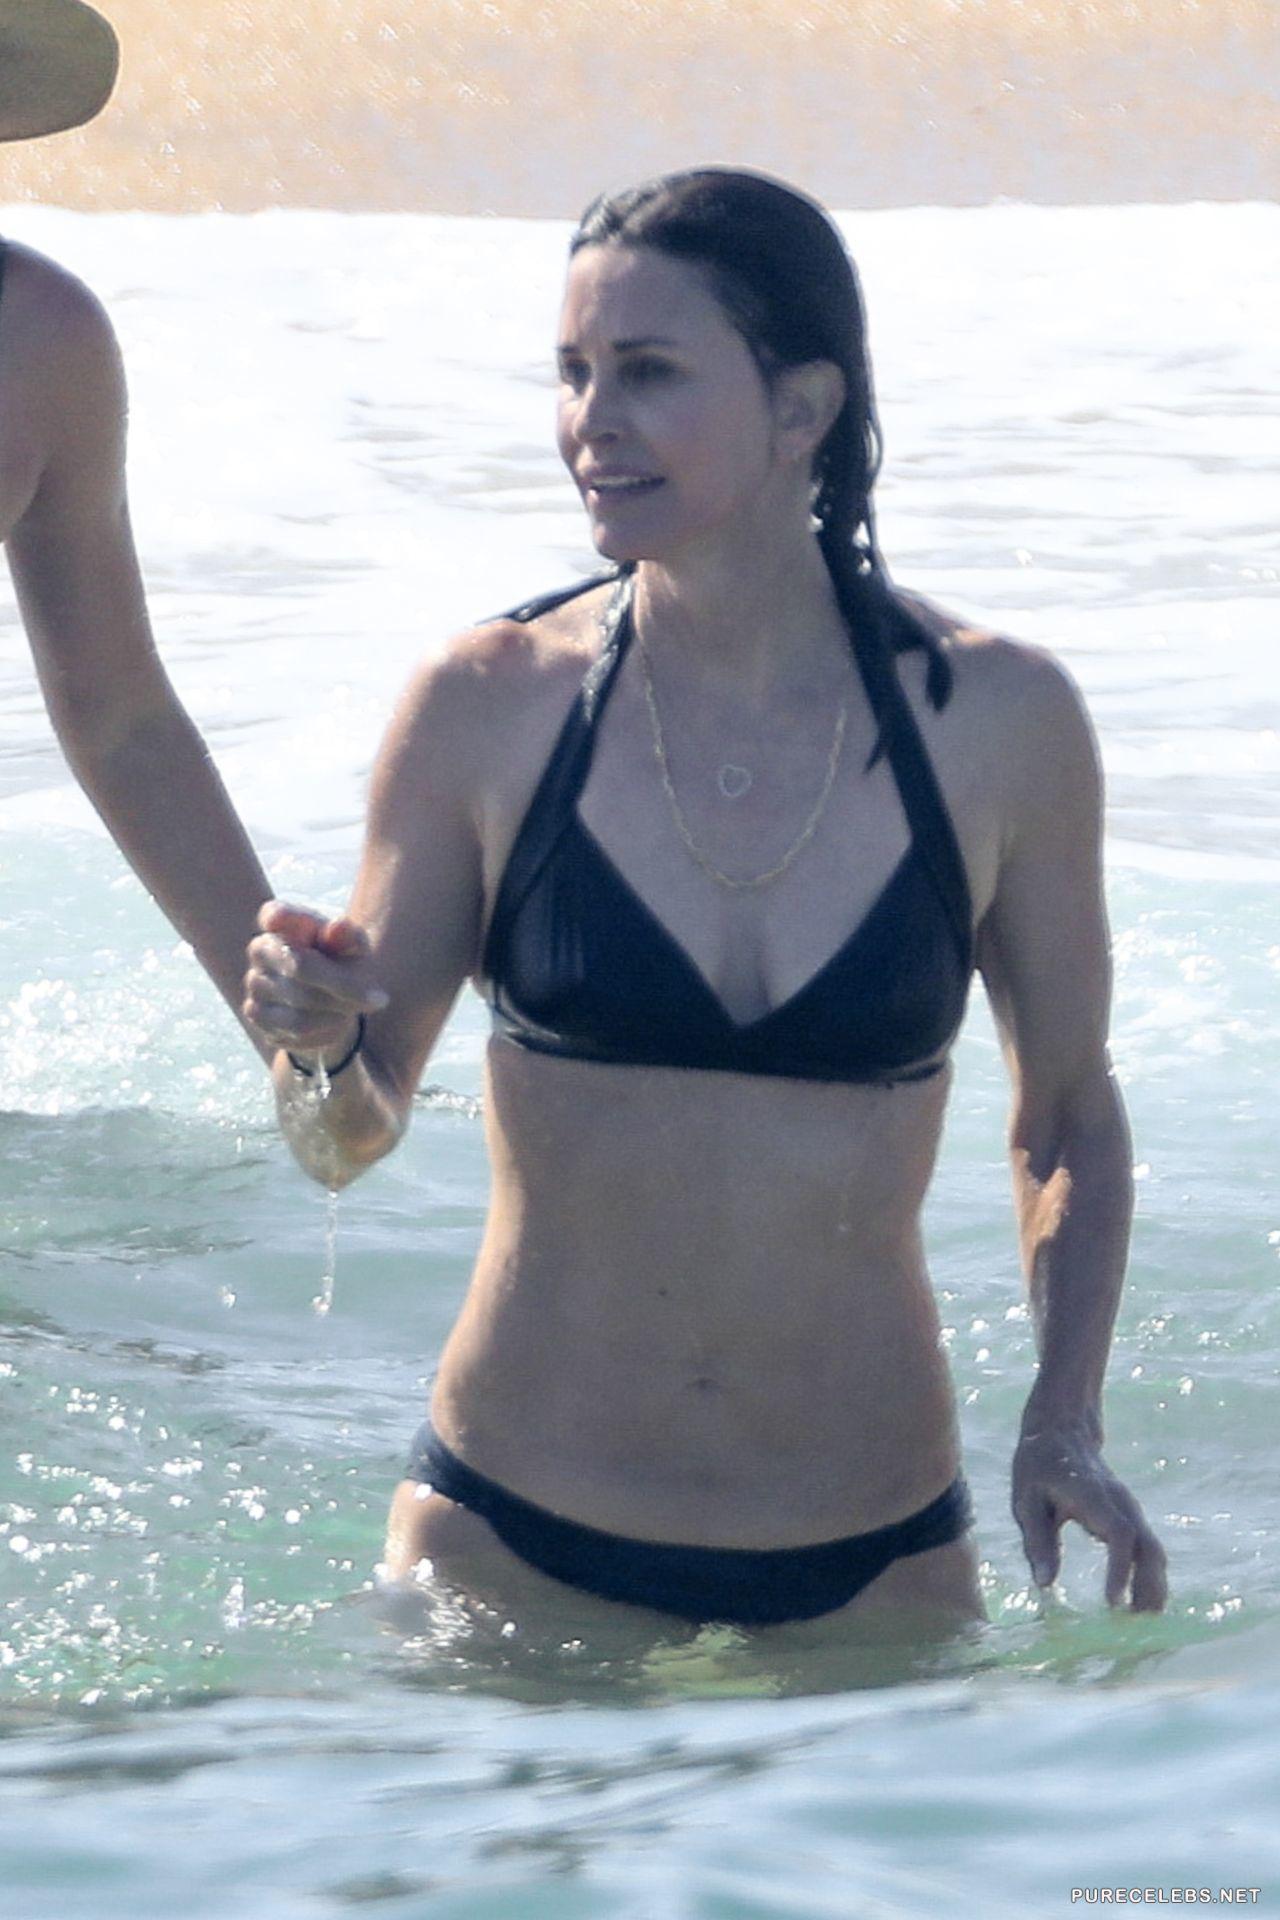 Swimsuit Aniston Jennifer Nude Paparazzi Pic Photos